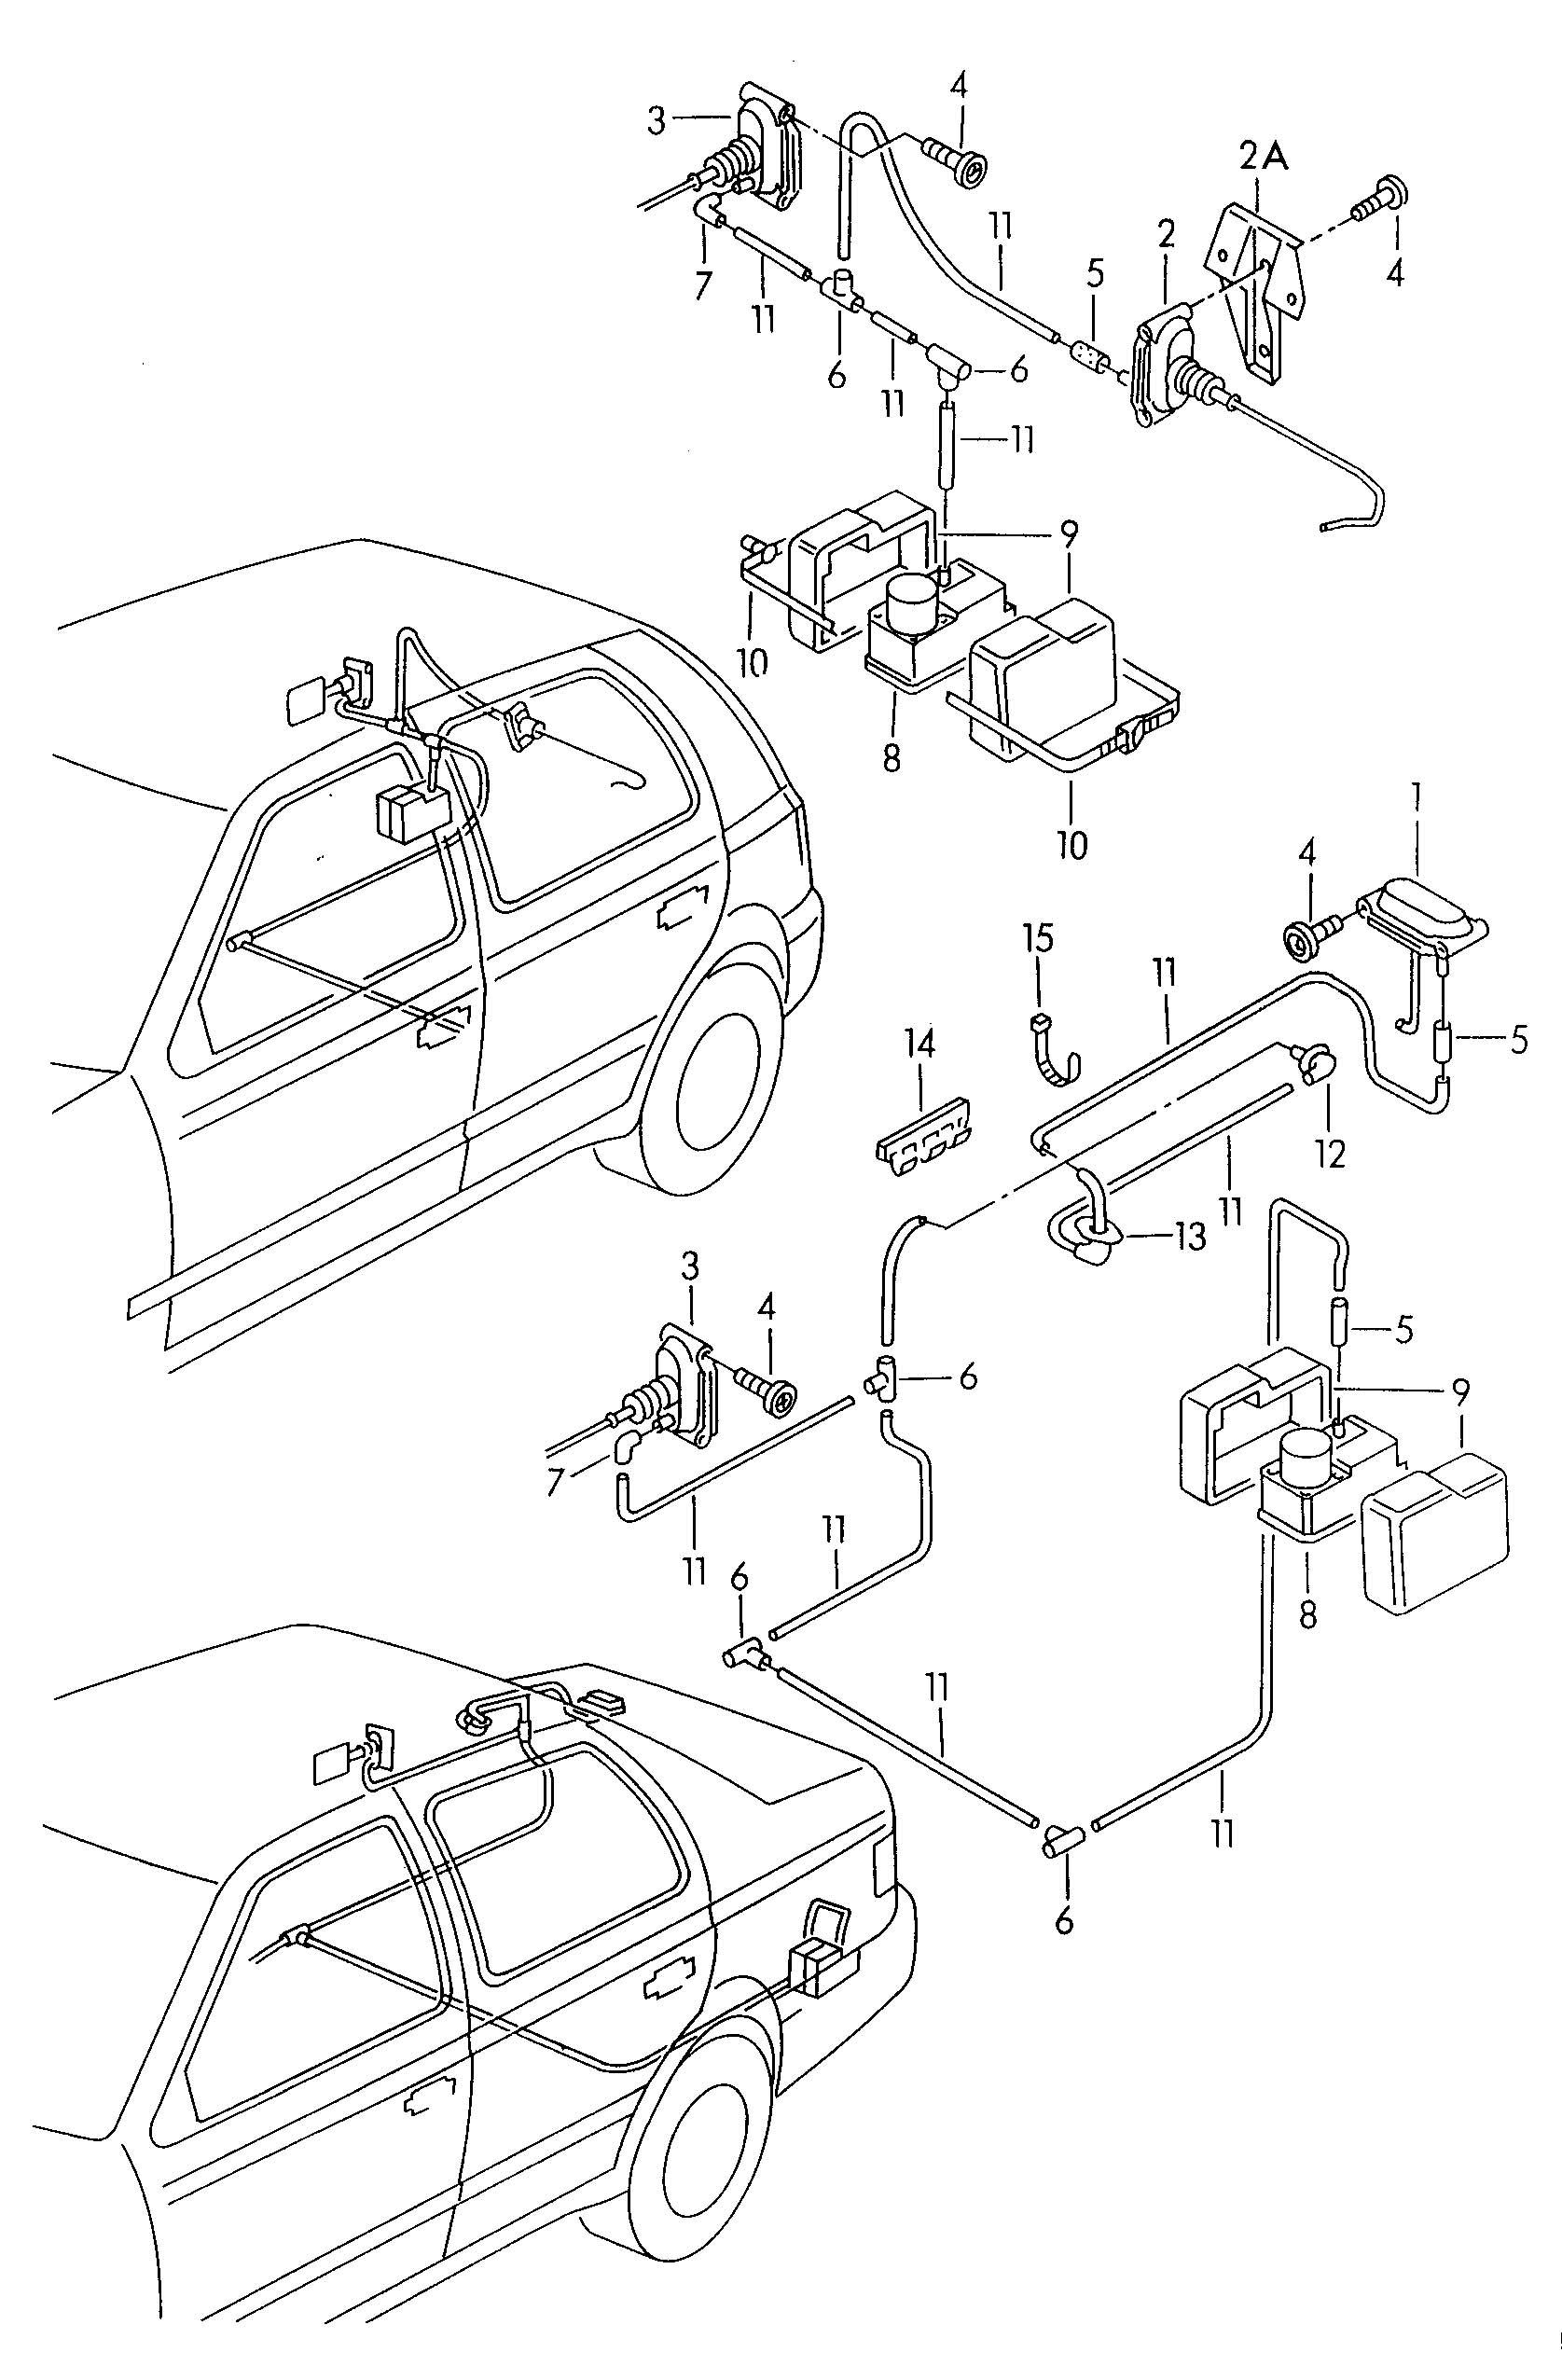 Volkswagen Cabrio Cabriolet Central Locking System For